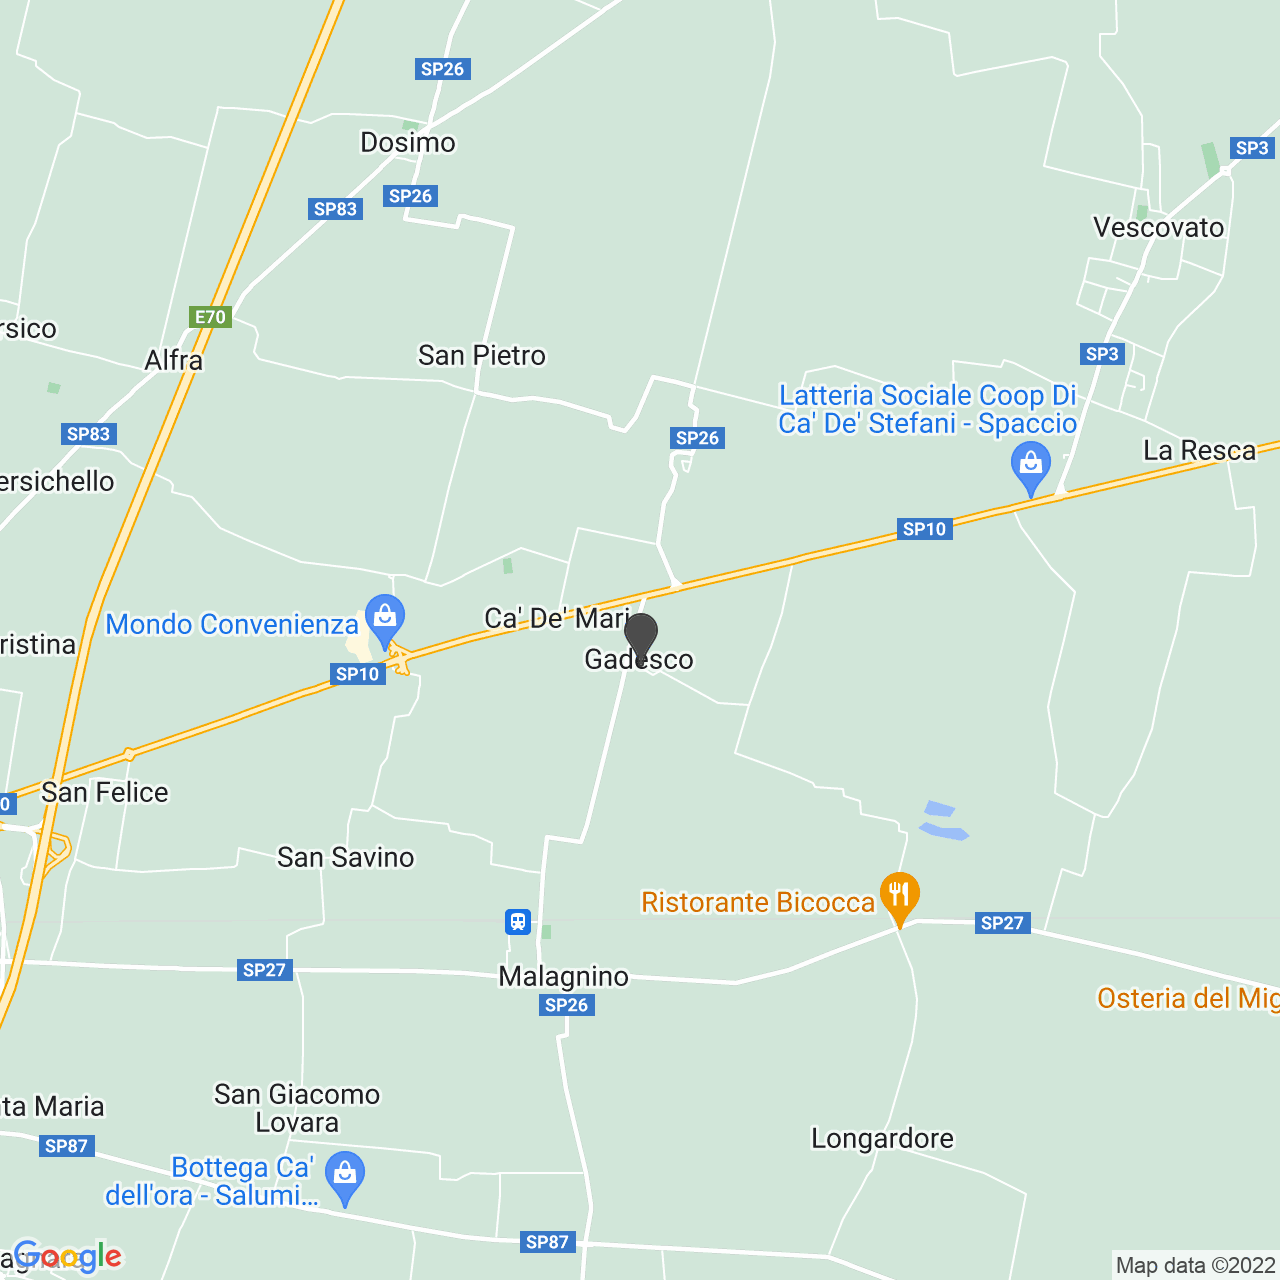 Chiesa dei Santi Gervasio e Protasio Martiri